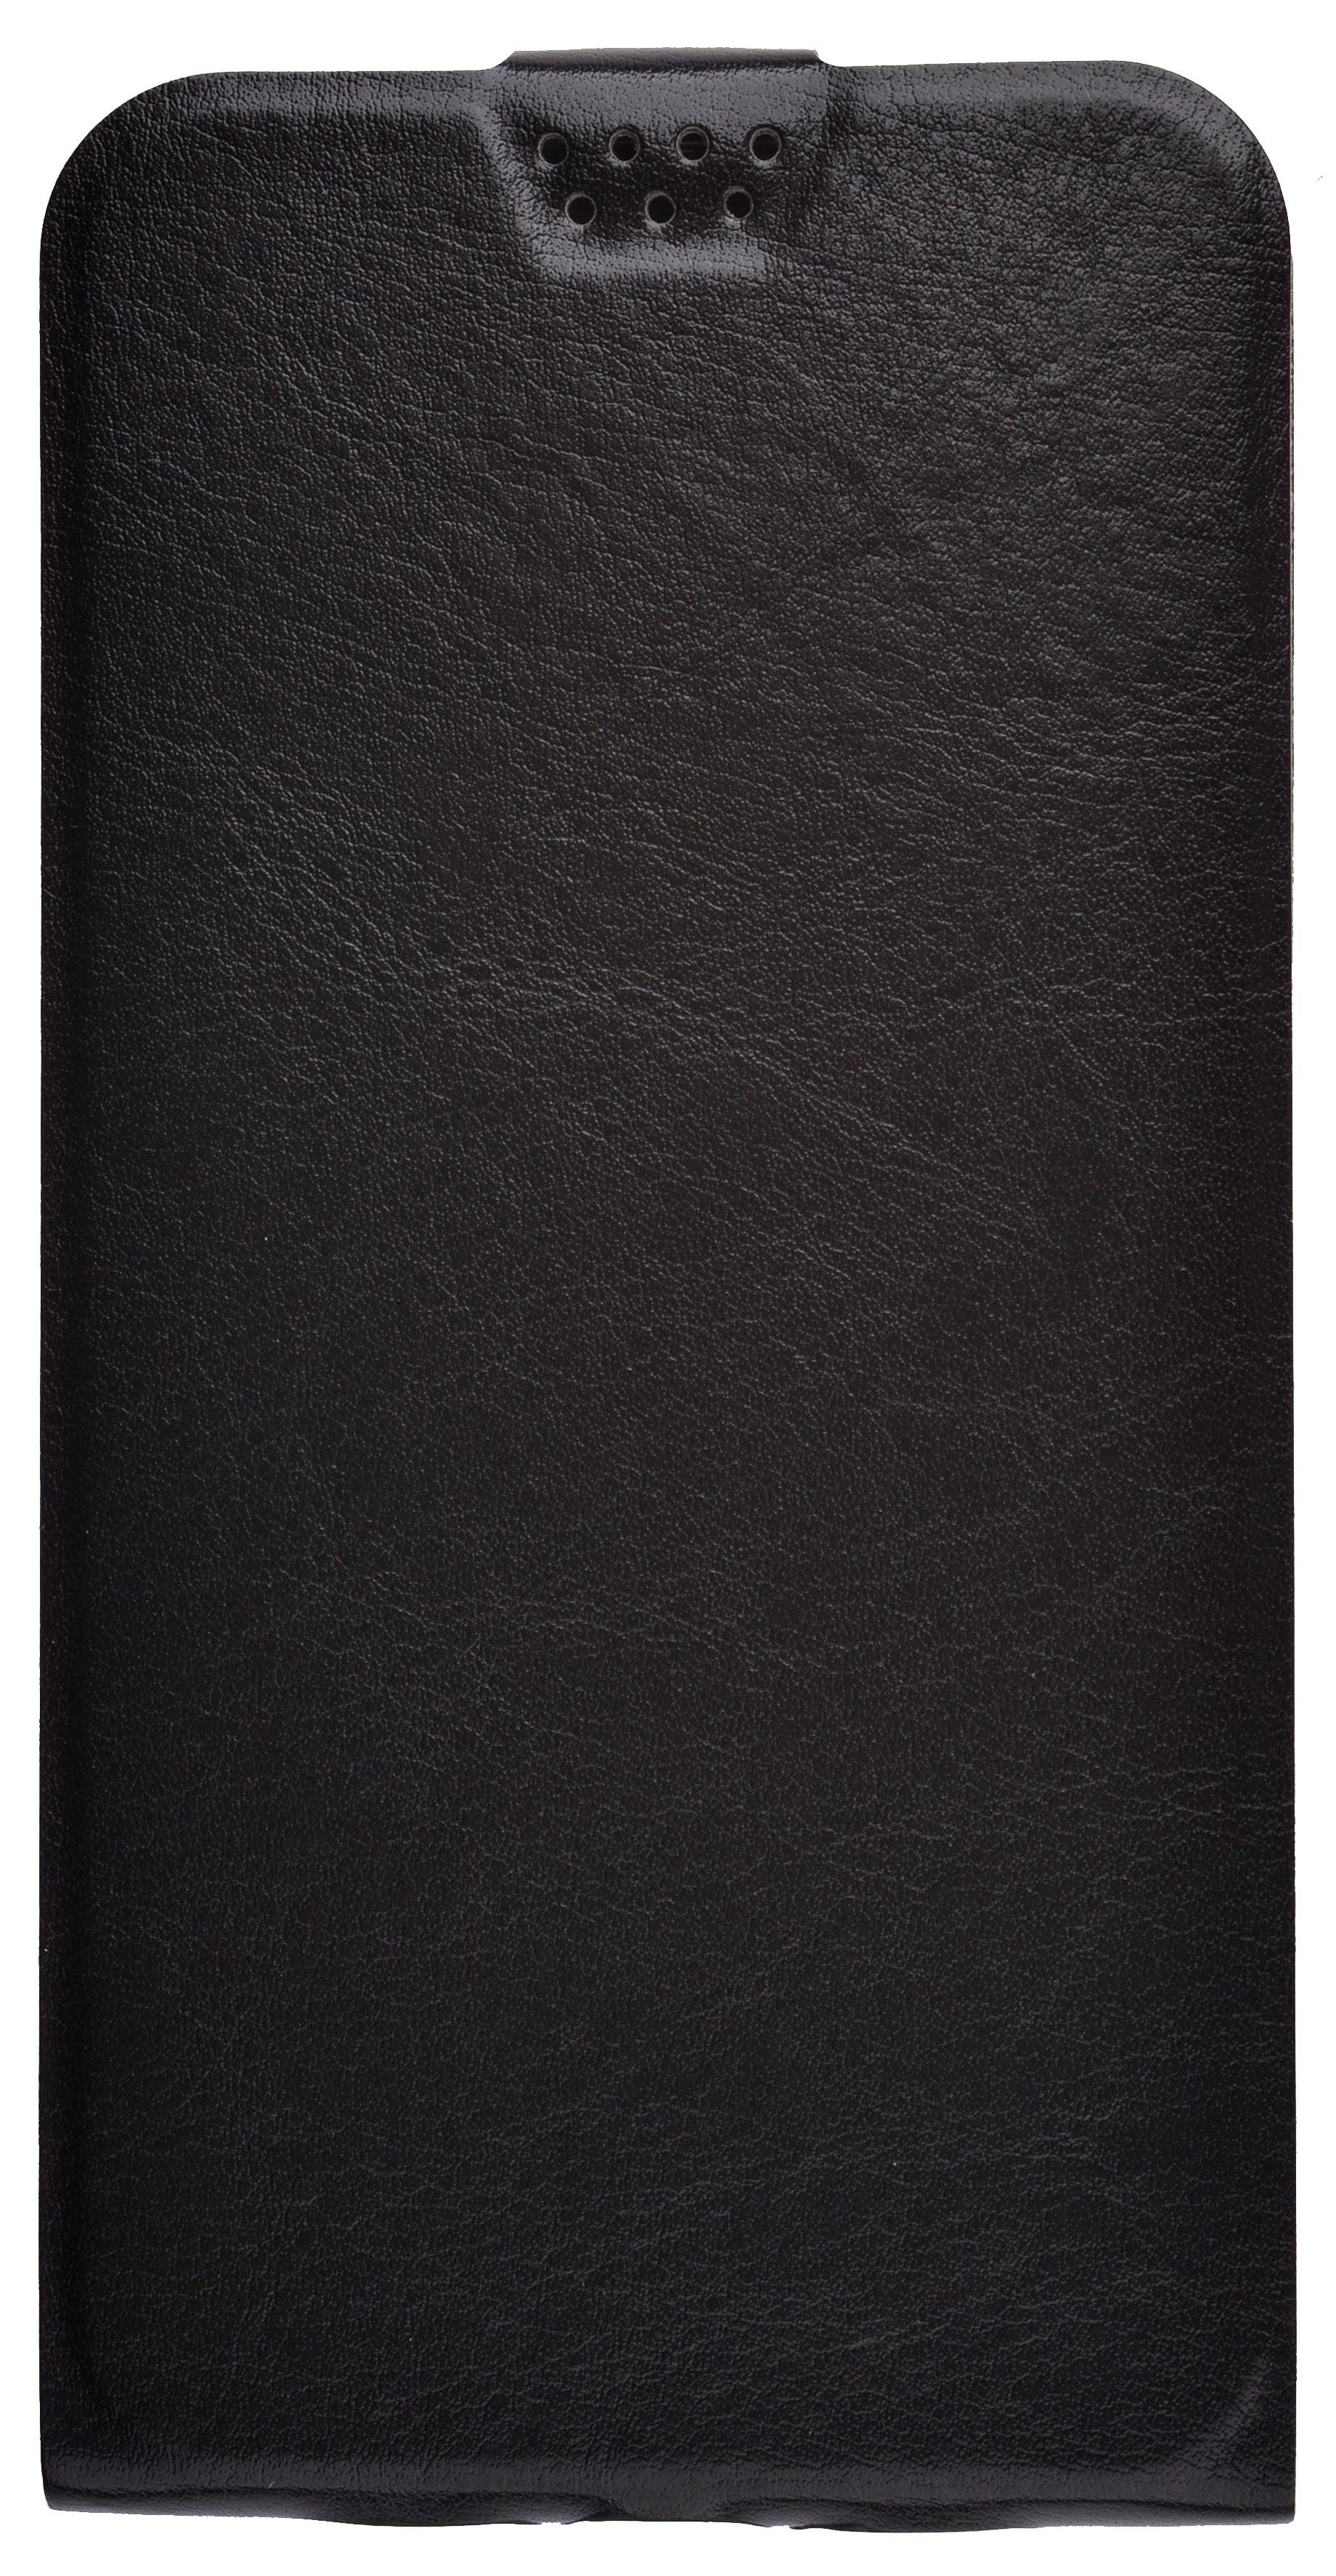 Чехол для сотового телефона skinBOX Flip slim, 4660041408201, черный flip pu leather protective stand case cover for zte blade l2